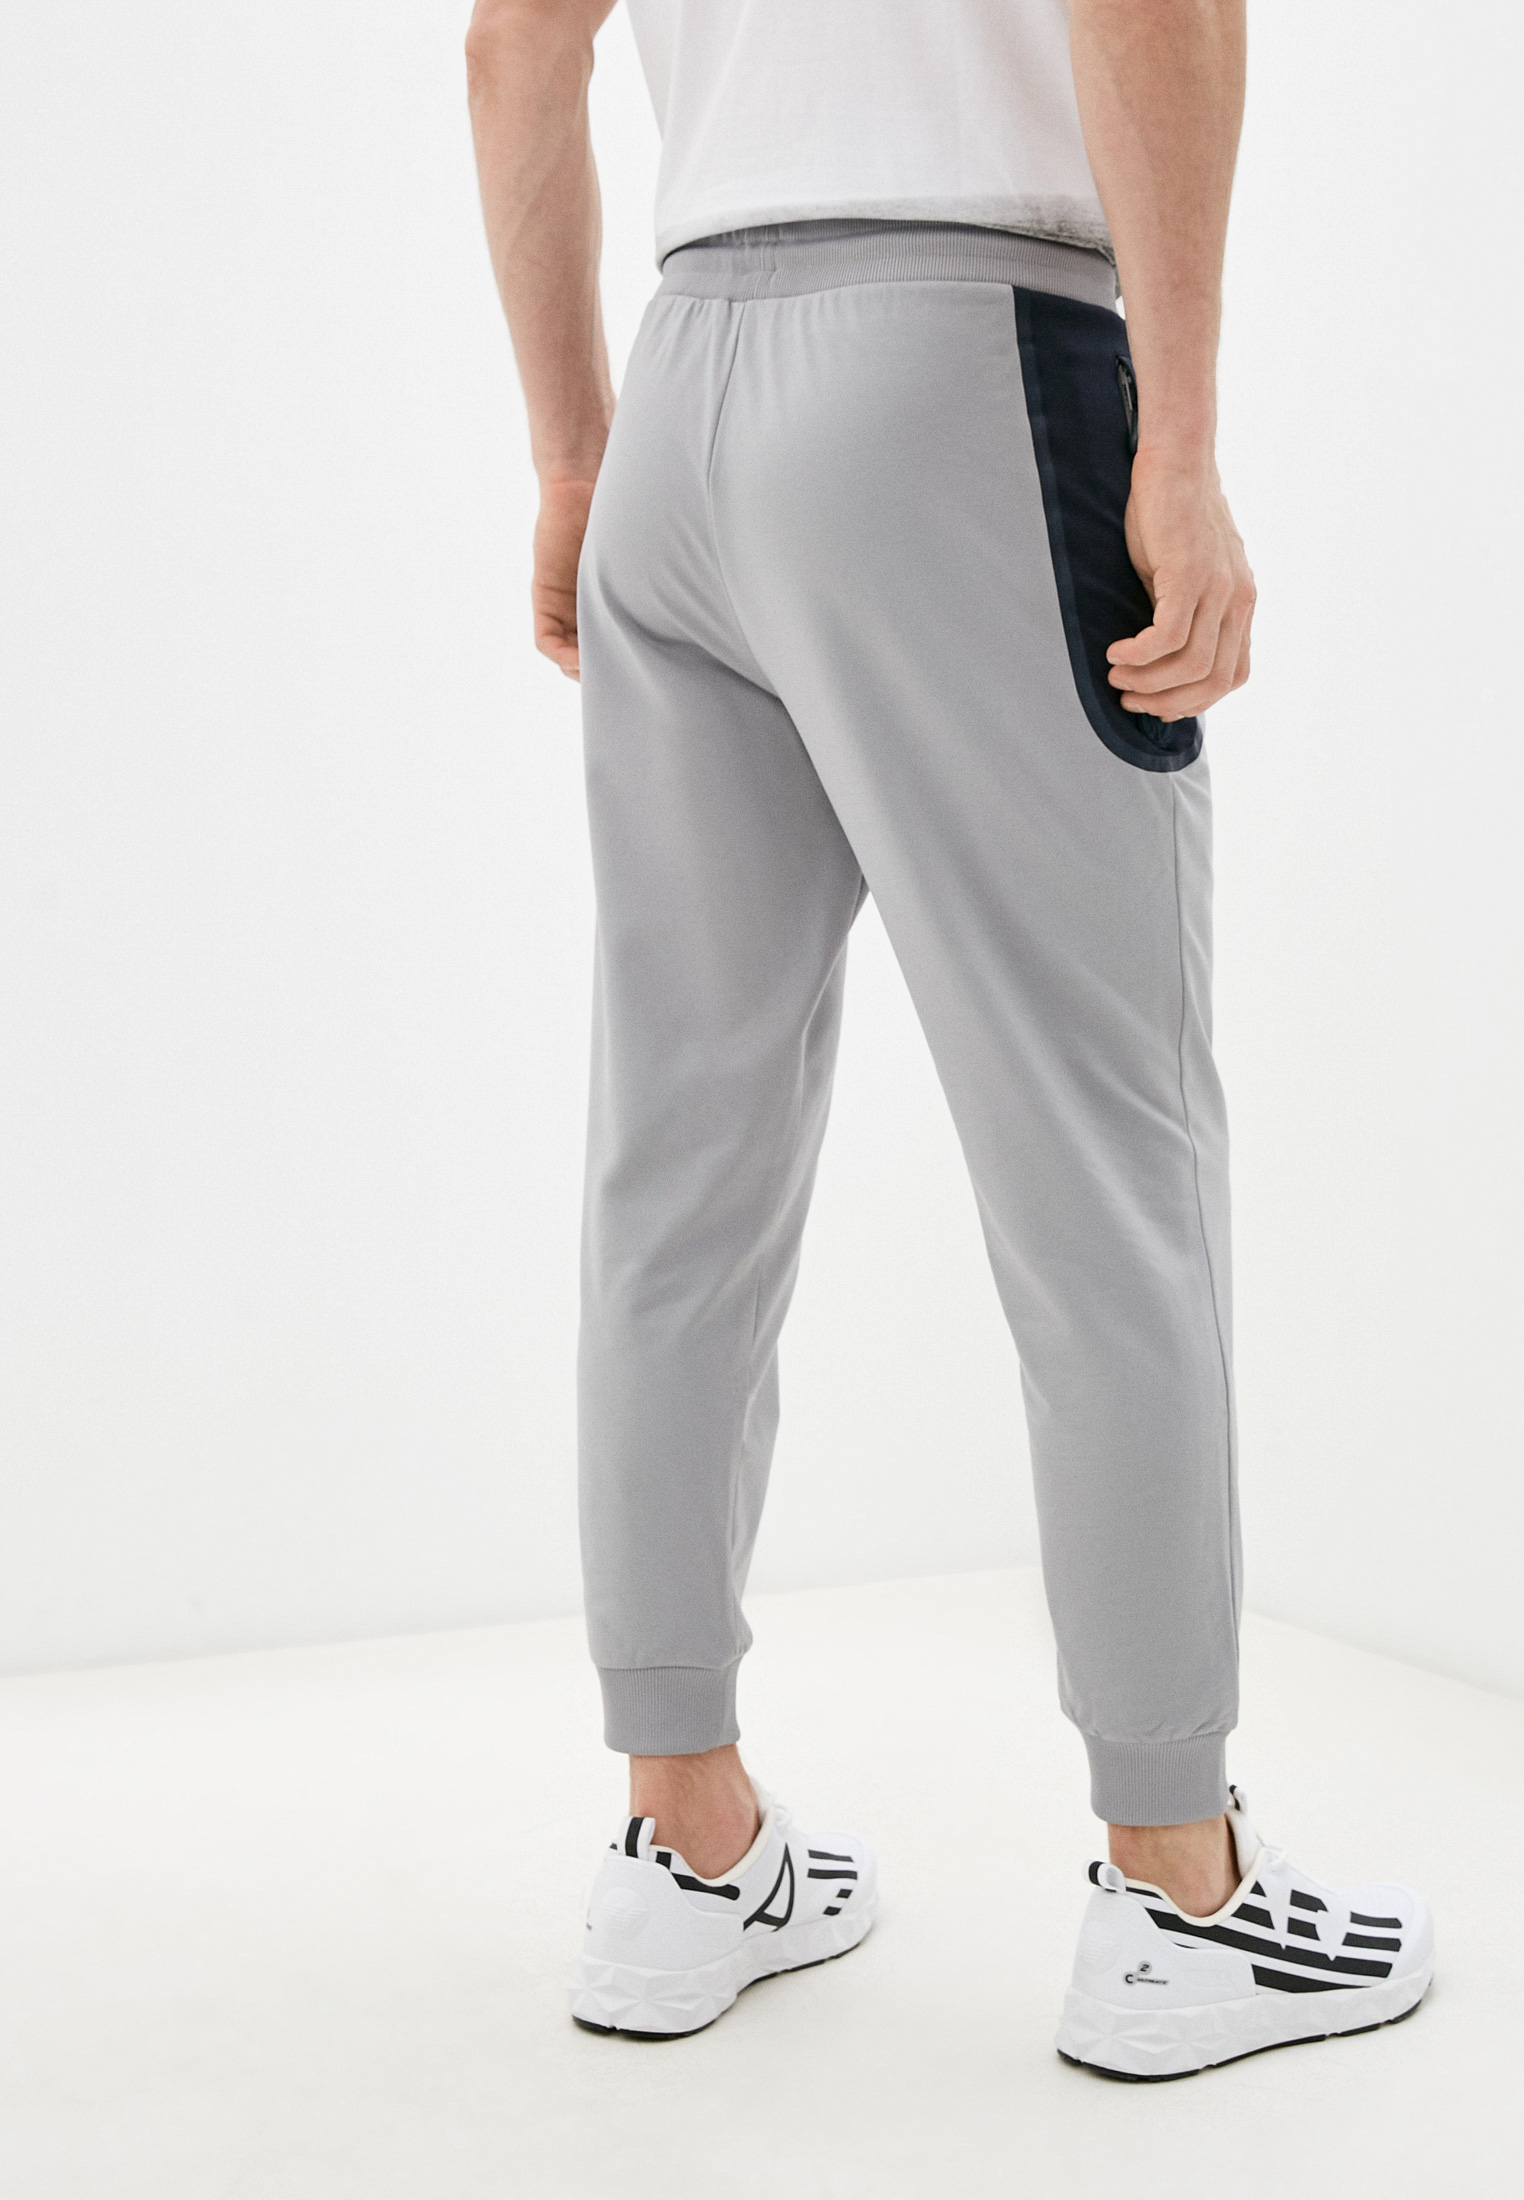 Мужские спортивные брюки Bikkembergs (Биккембергс) C183CGSEB010: изображение 4